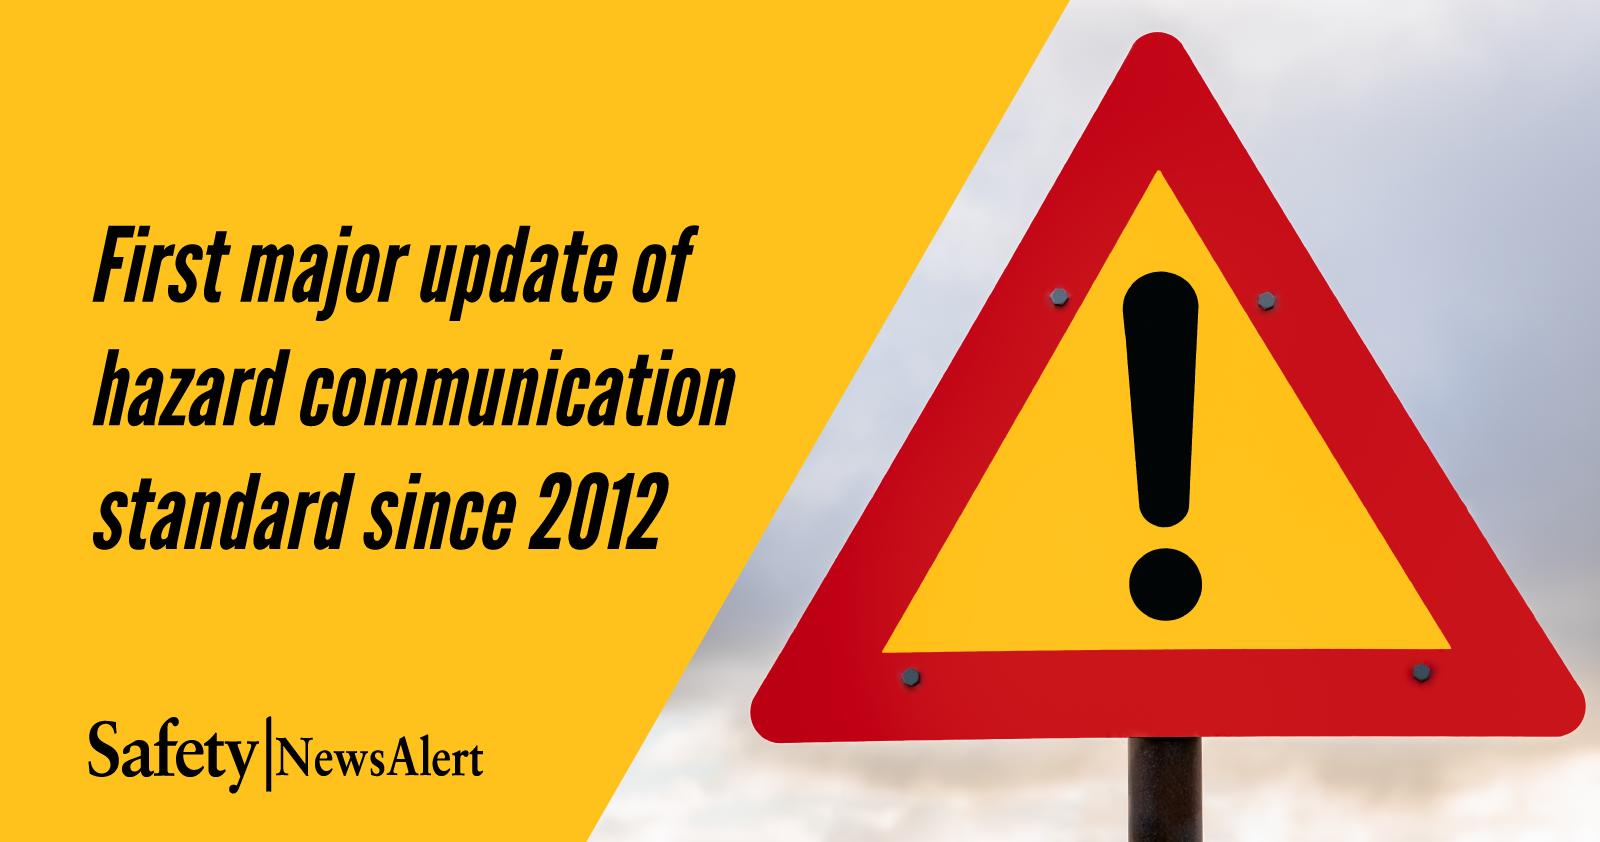 First Major Update Of Hazard Communication Standard Since 2012